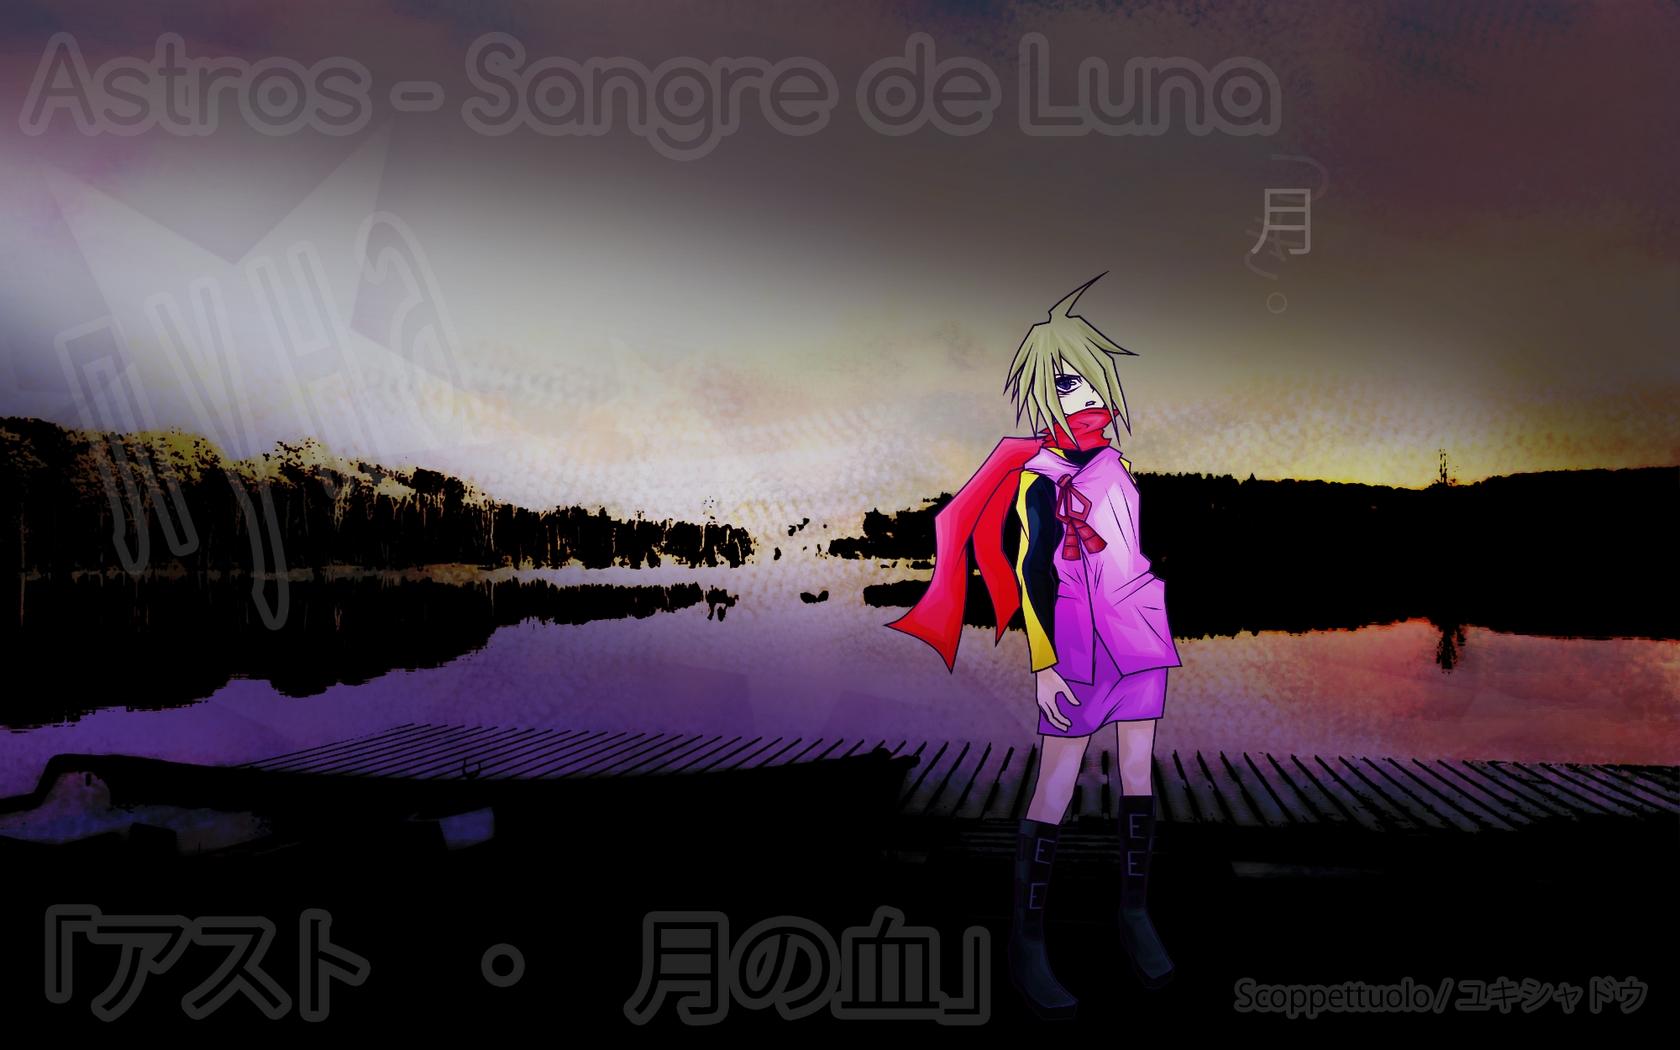 Astros - Sangre de Luna